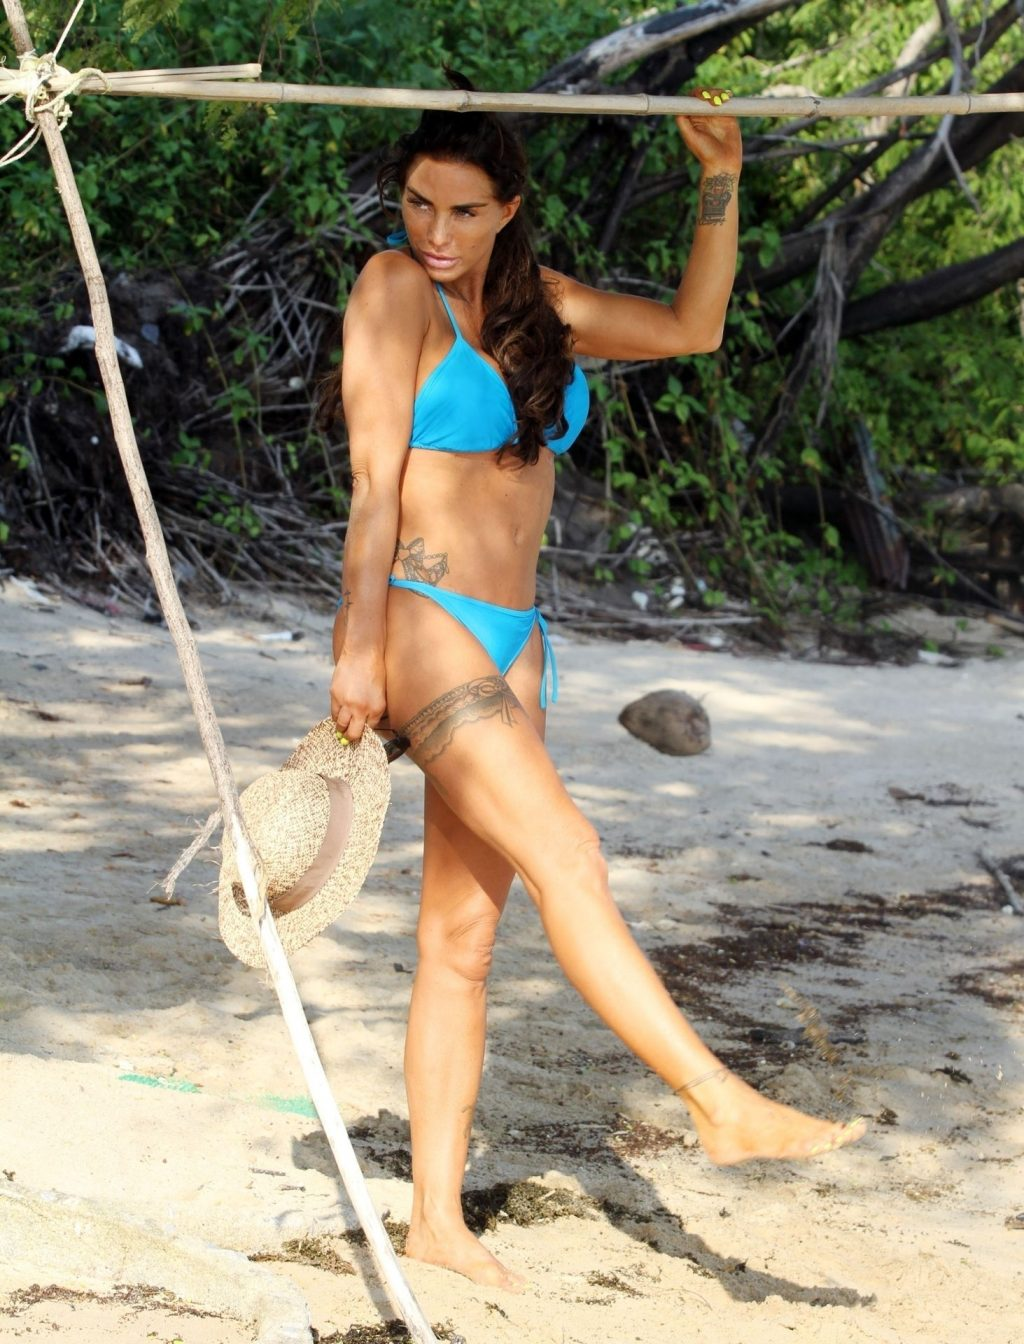 Katie Price Looks Sexy in Her Blue Bikini in Thailand (7 Photos)